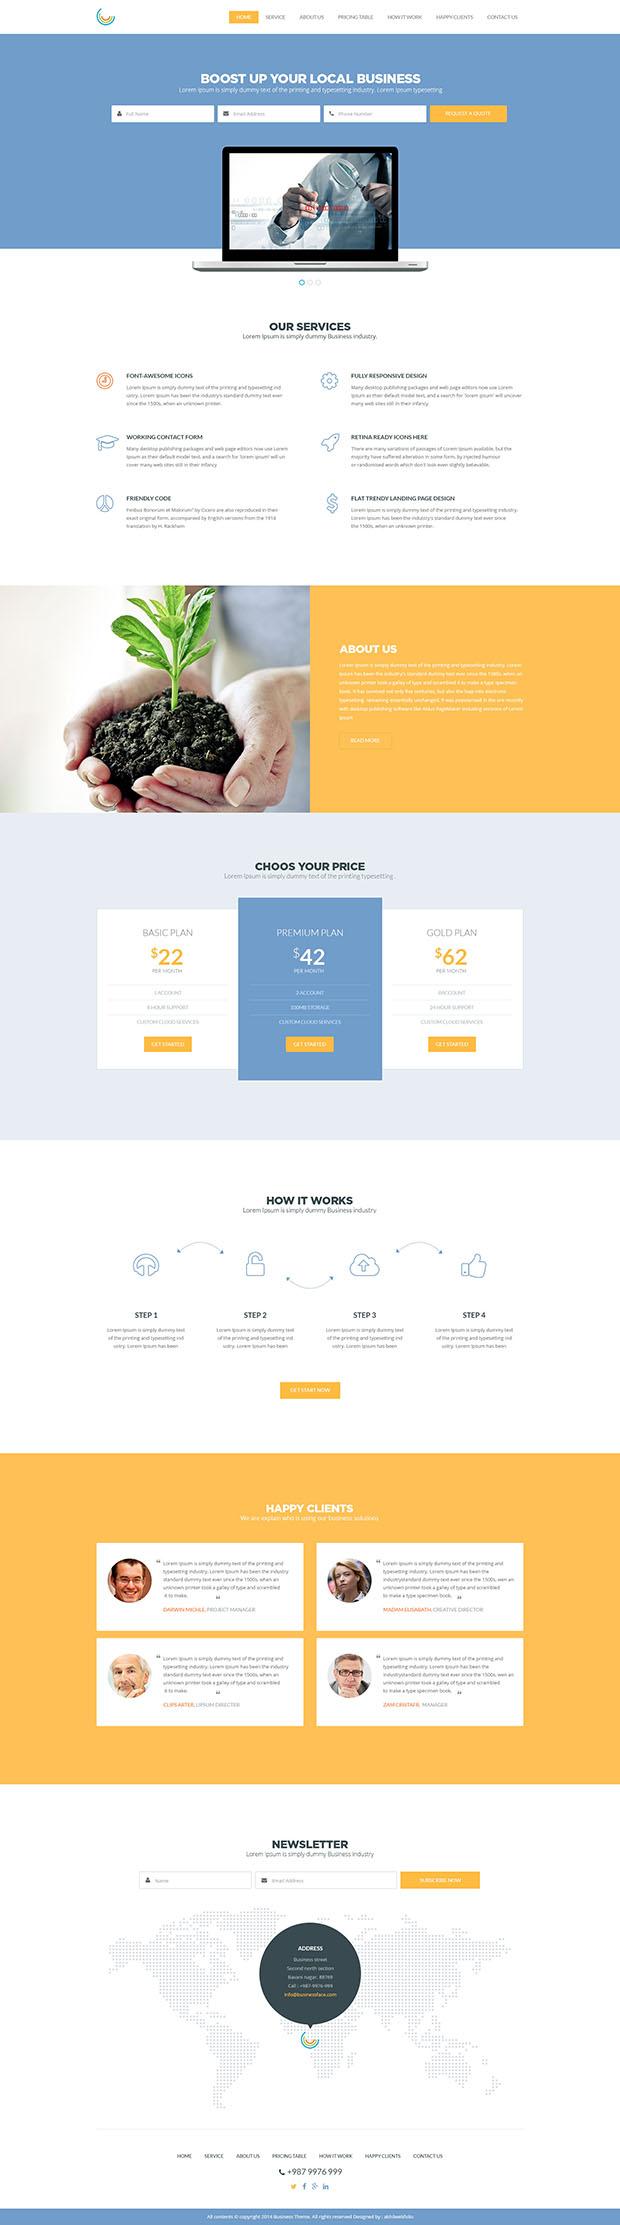 Business-Web-Template-PSD-Freebie